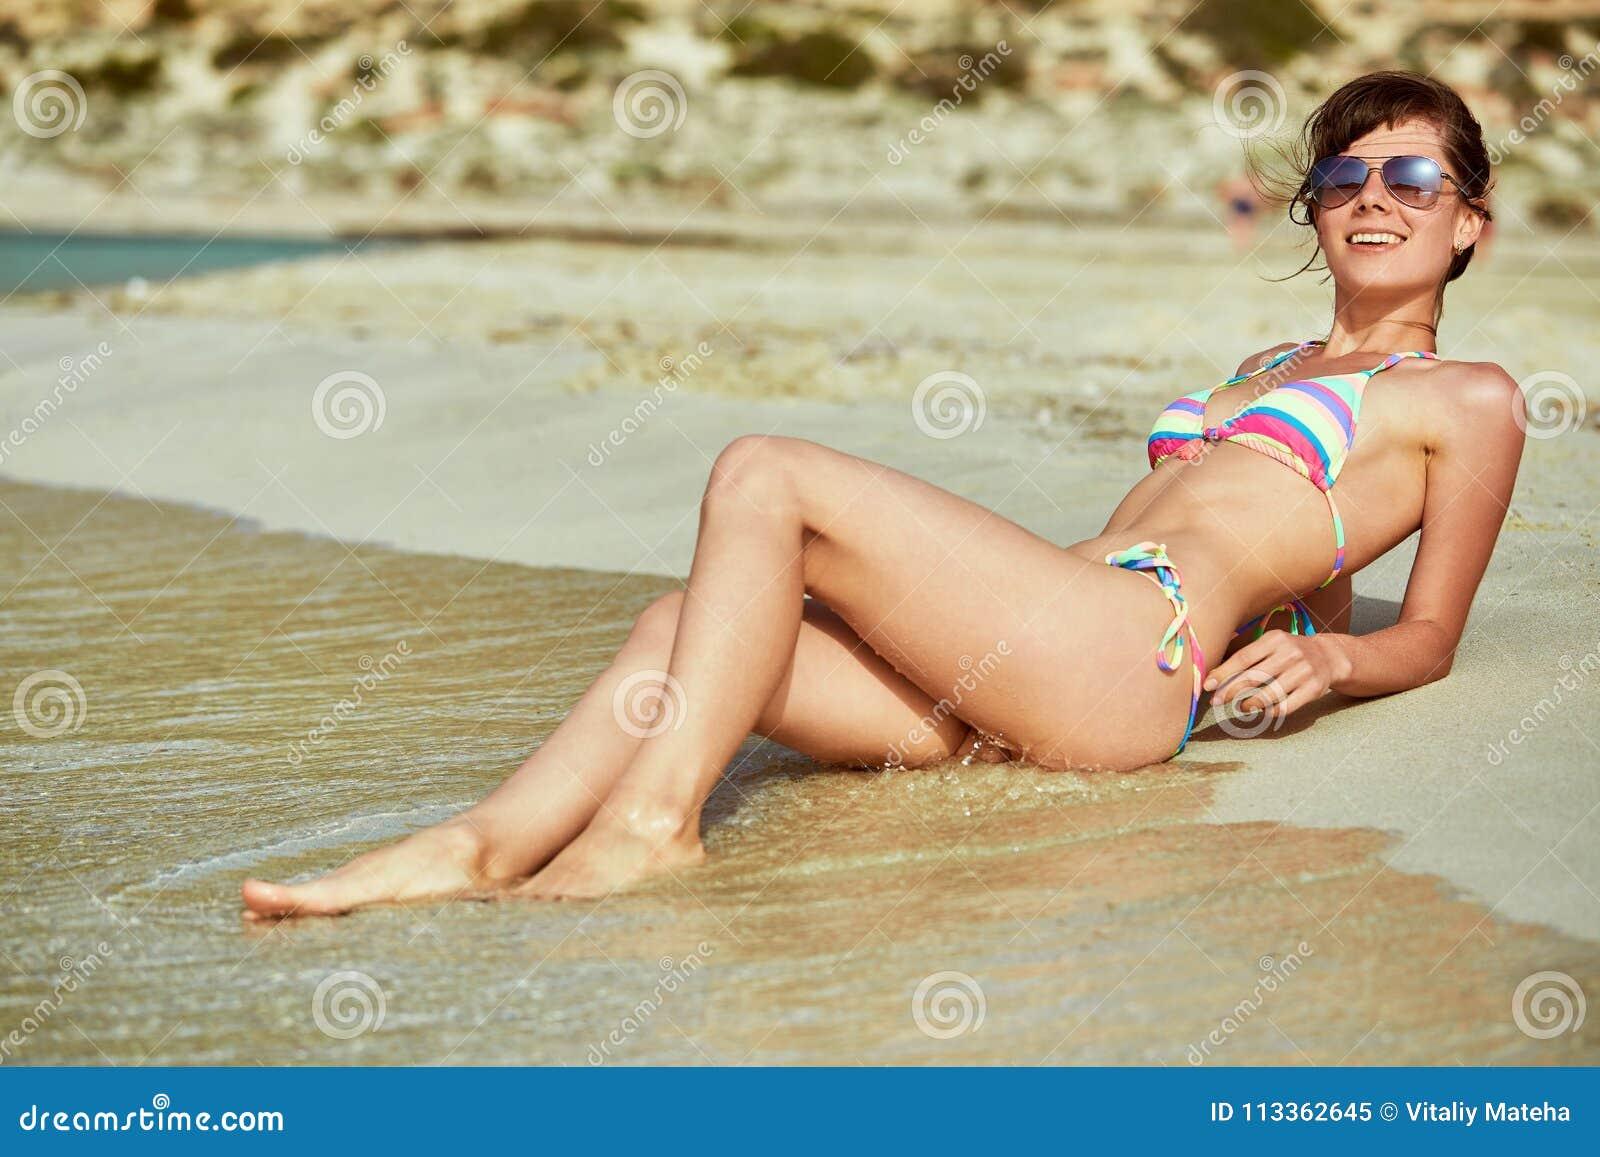 On woman beach lying Video of